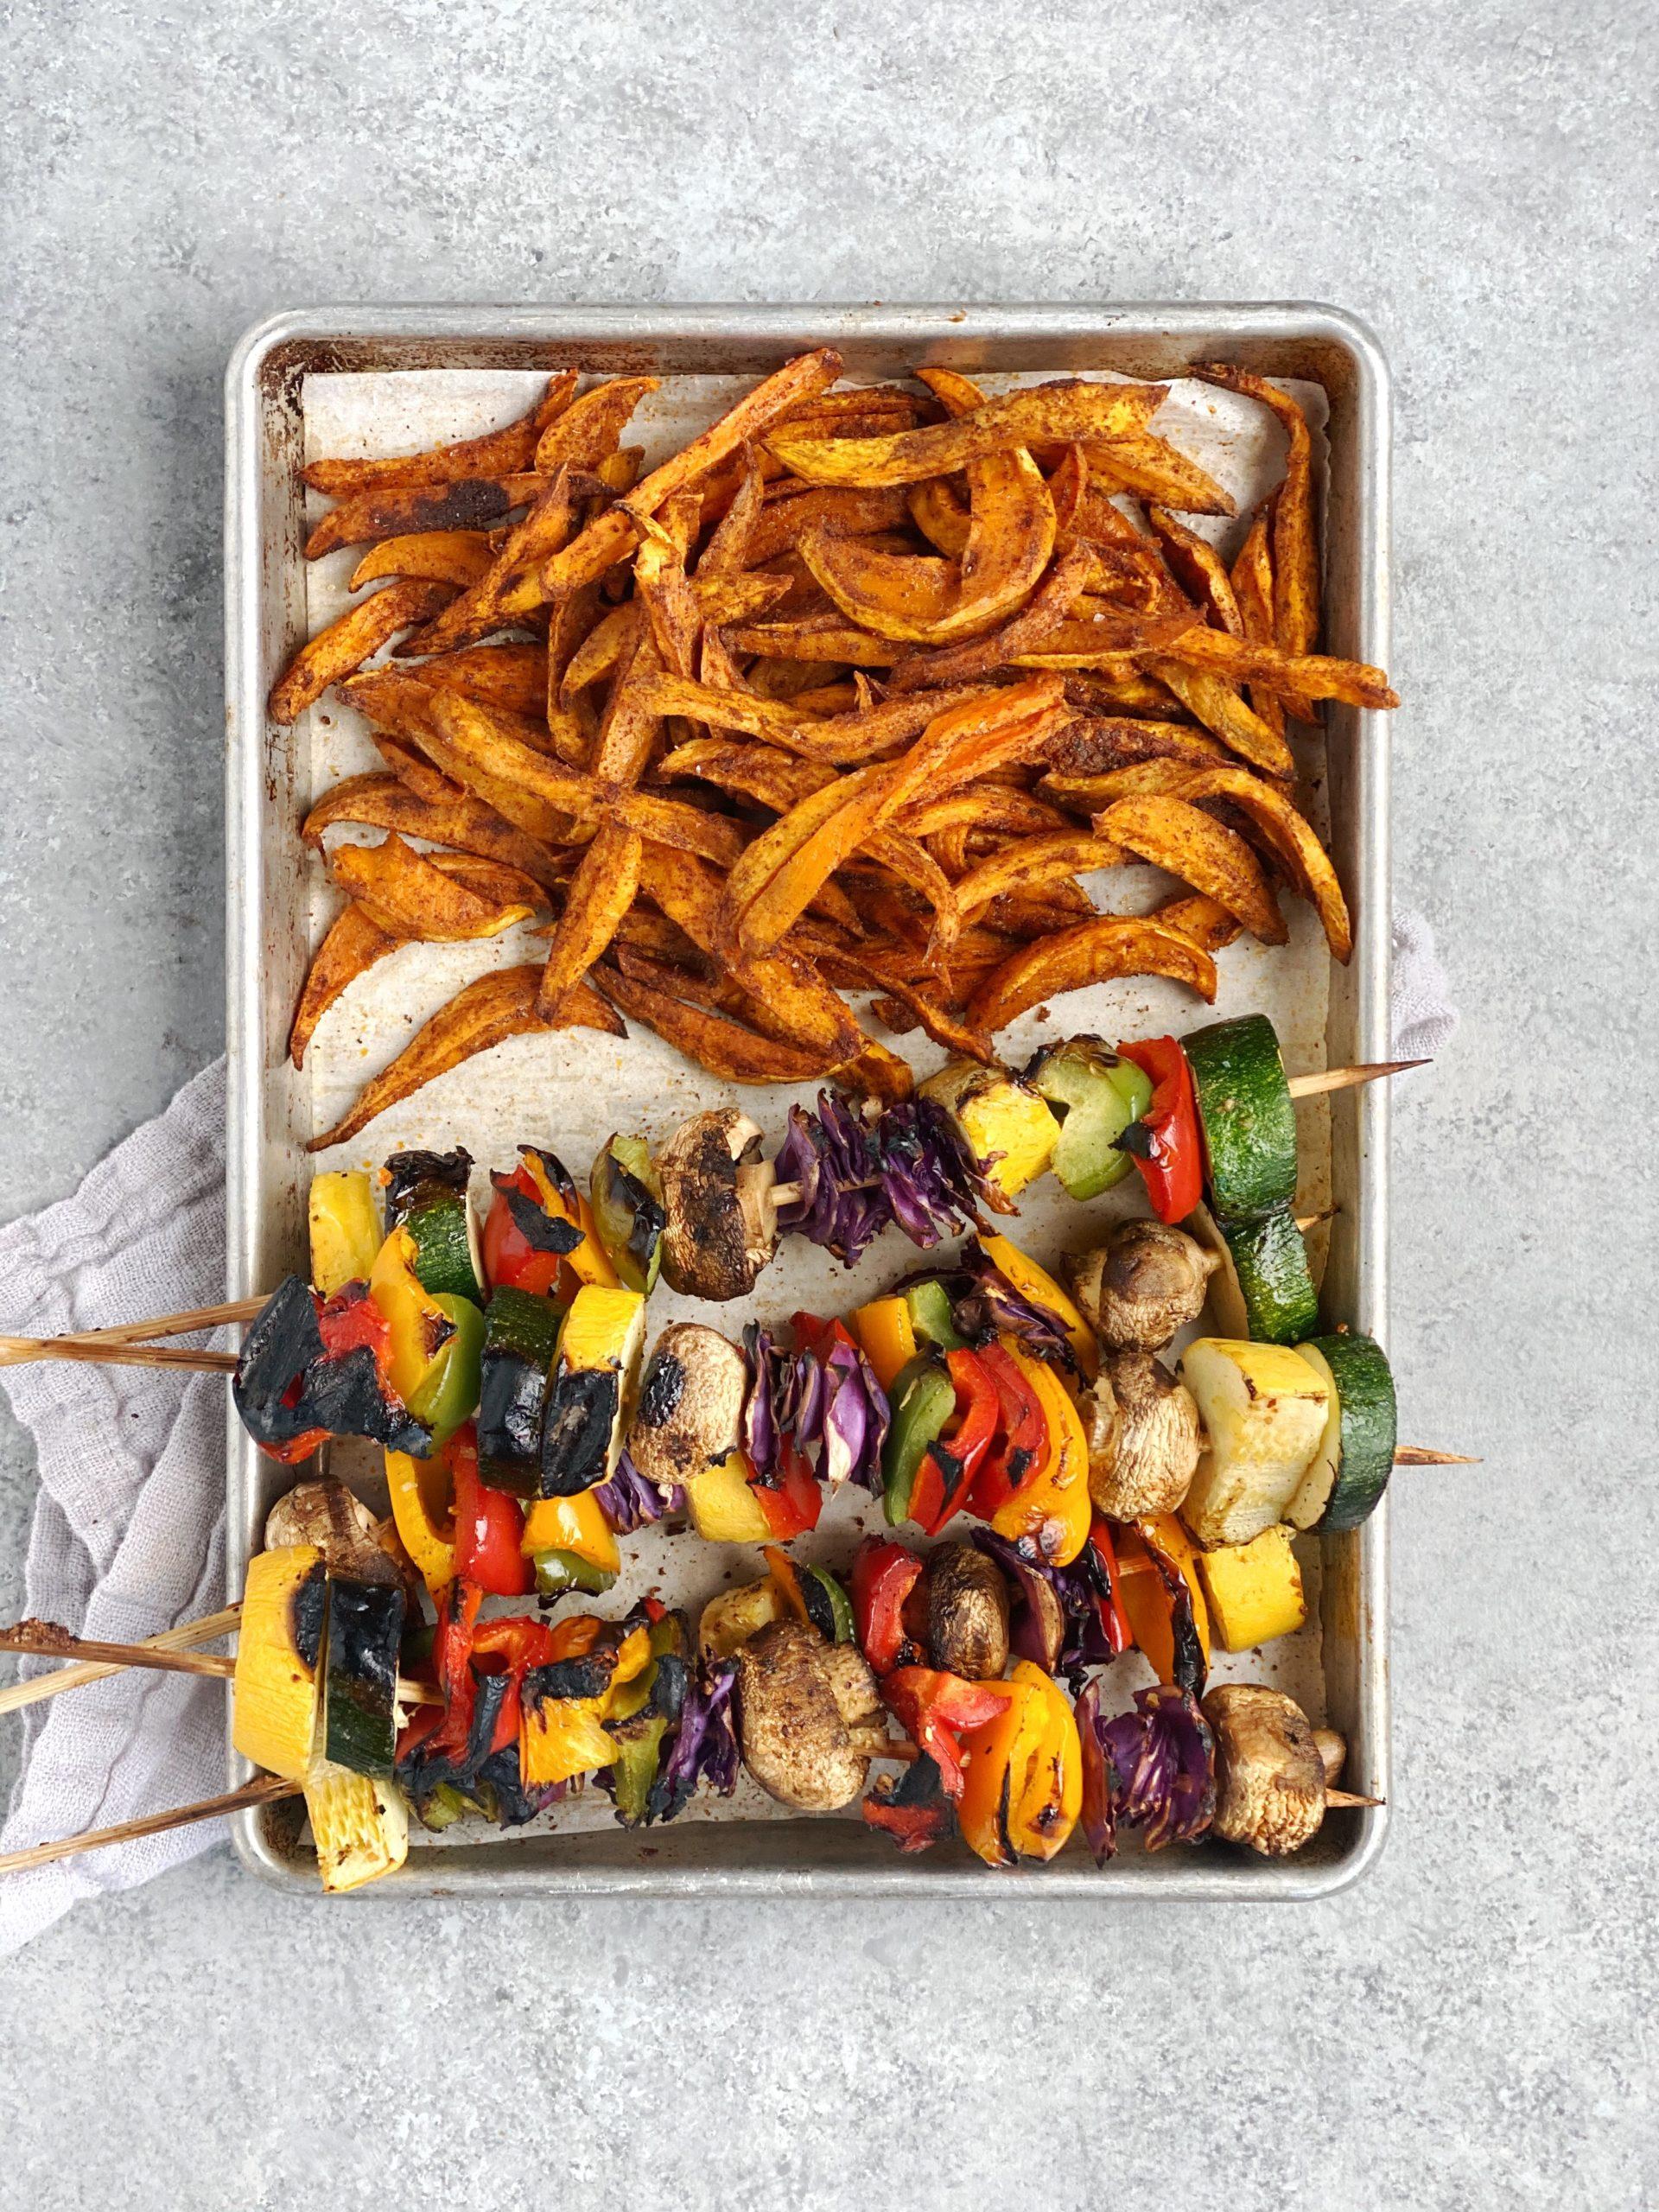 The Guaranteed way to eat more veggies   simplerootswellness.com #batchcooking #mealprep #healthy #homemade #vegetables #gethealthy #easy #eat #recipes